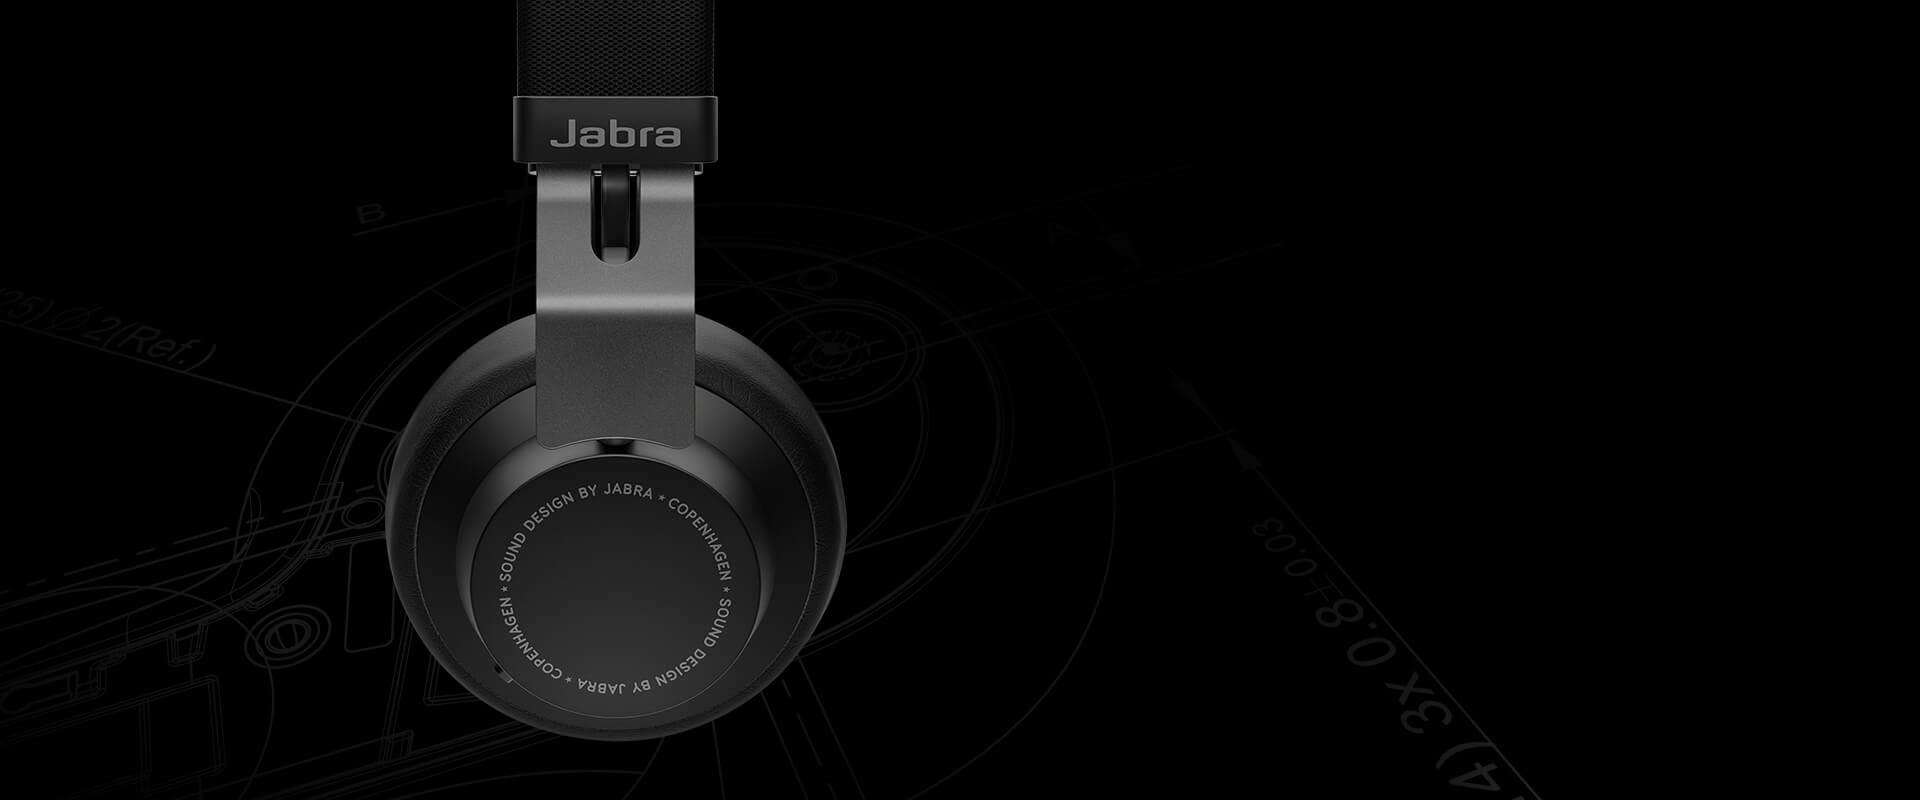 c939ceb4860f2 Wireless Headphones for calls and music   Jabra Move Wireless Style ...